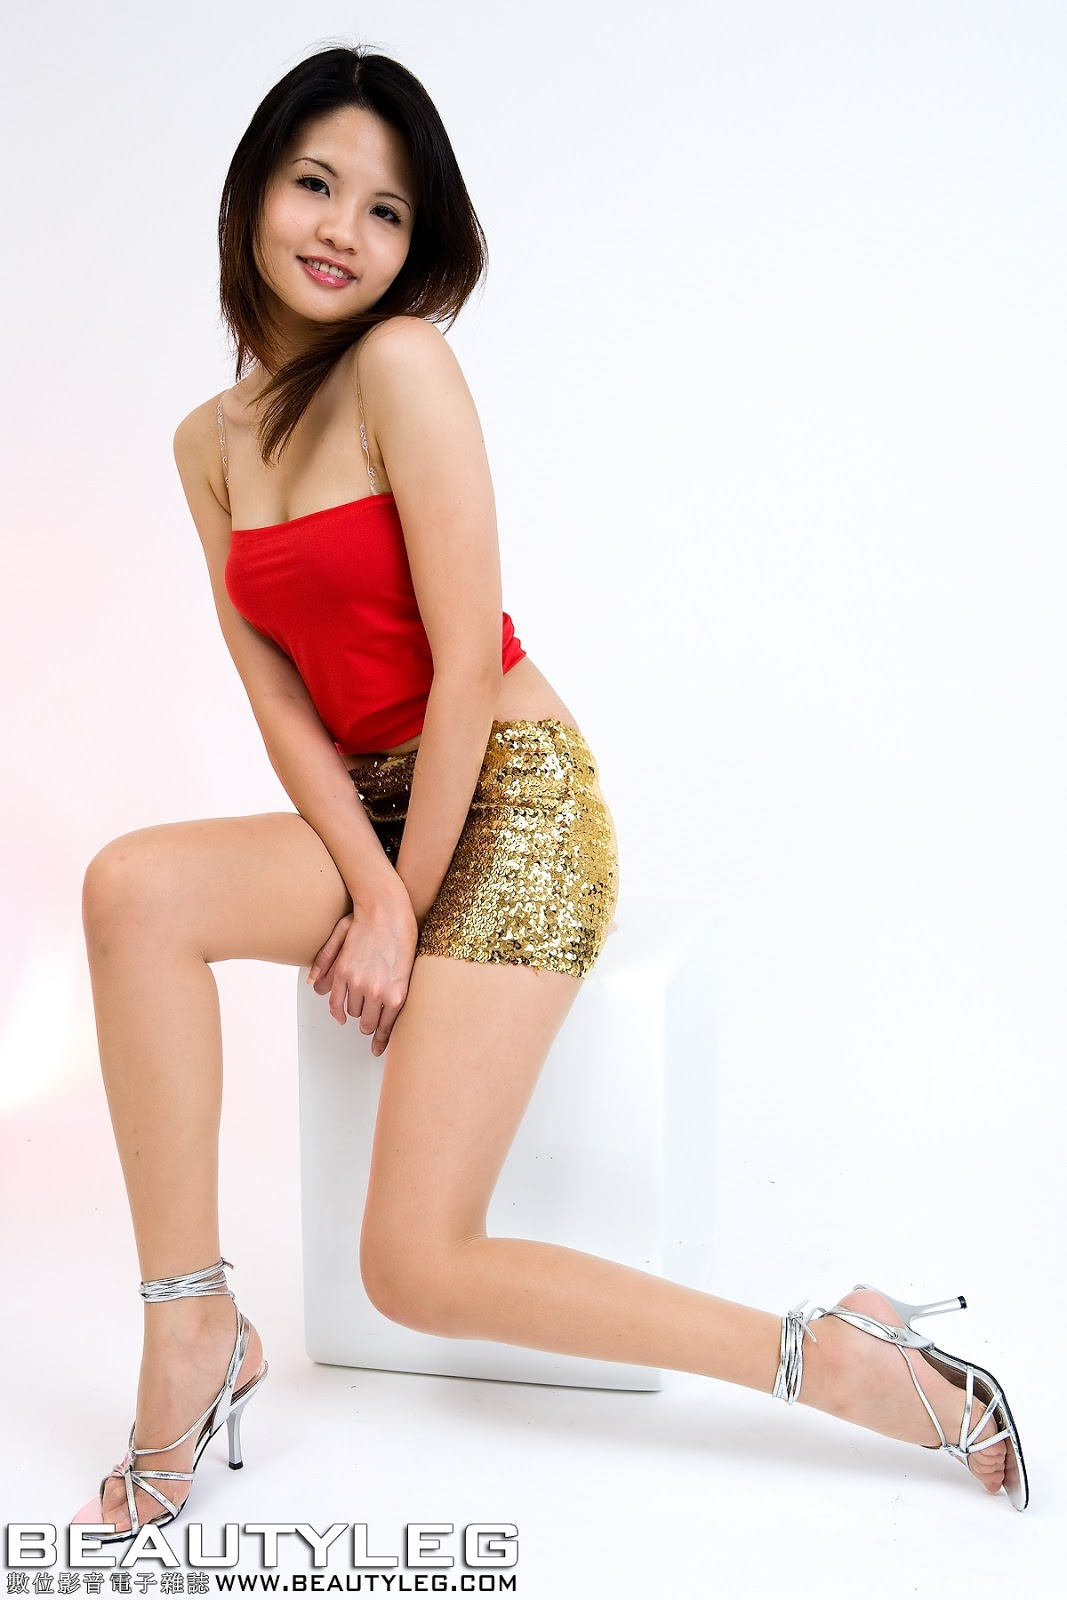 Tight mini skirt asians, - 21 Pics - xHamstercom